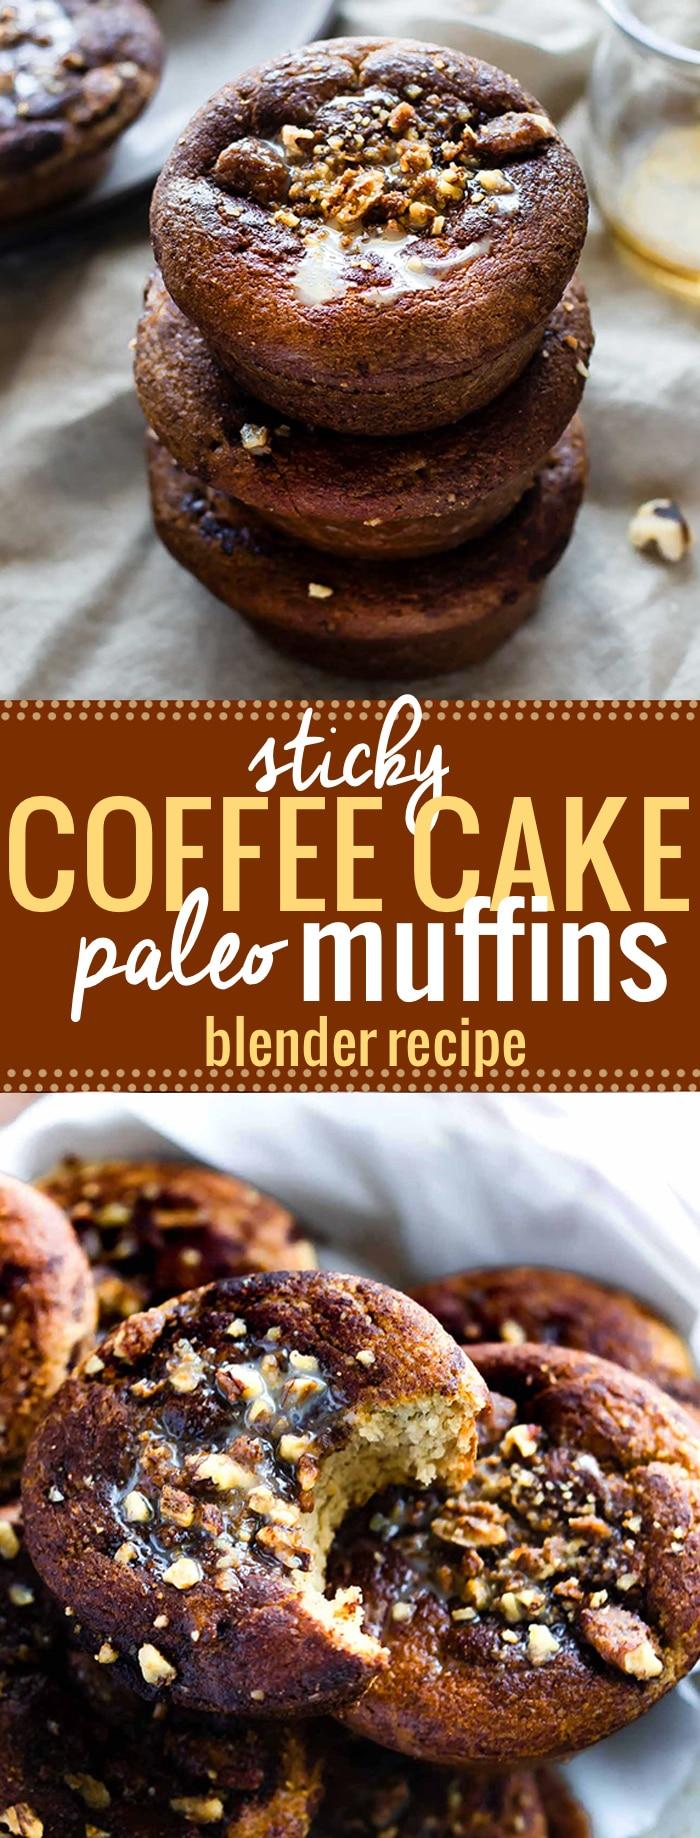 Paleo Spice Cake Muffin Mix